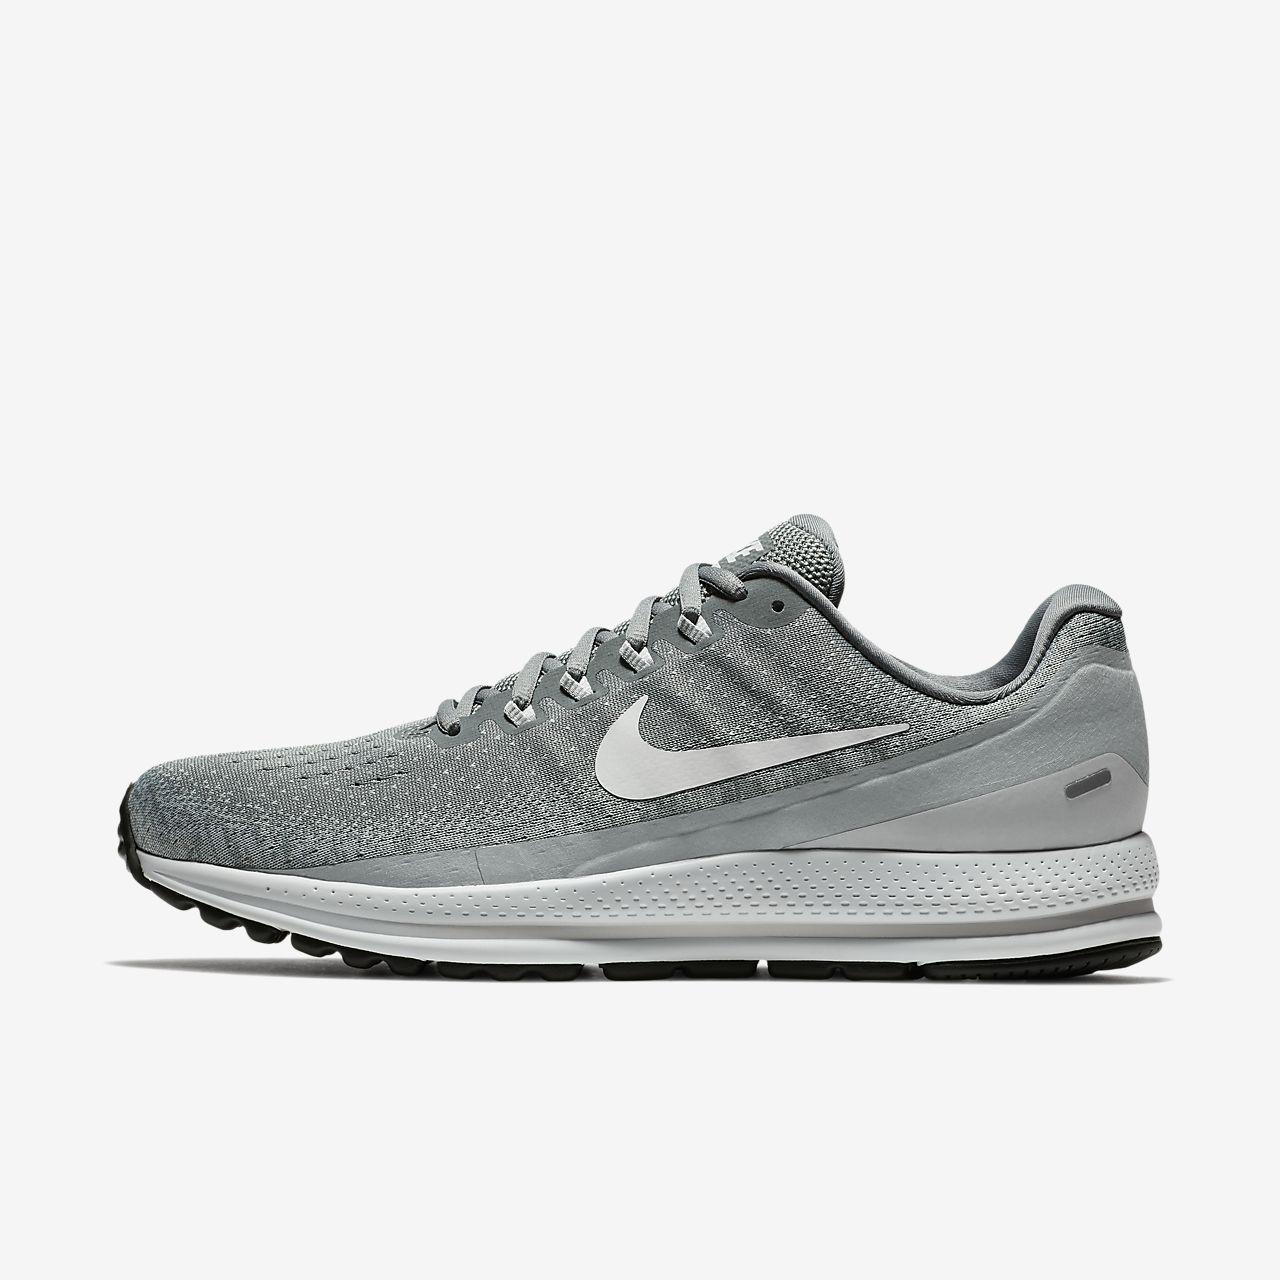 3e48ad2603d Nike Air Zoom Vomero 13 Men s Running Shoe. Nike.com